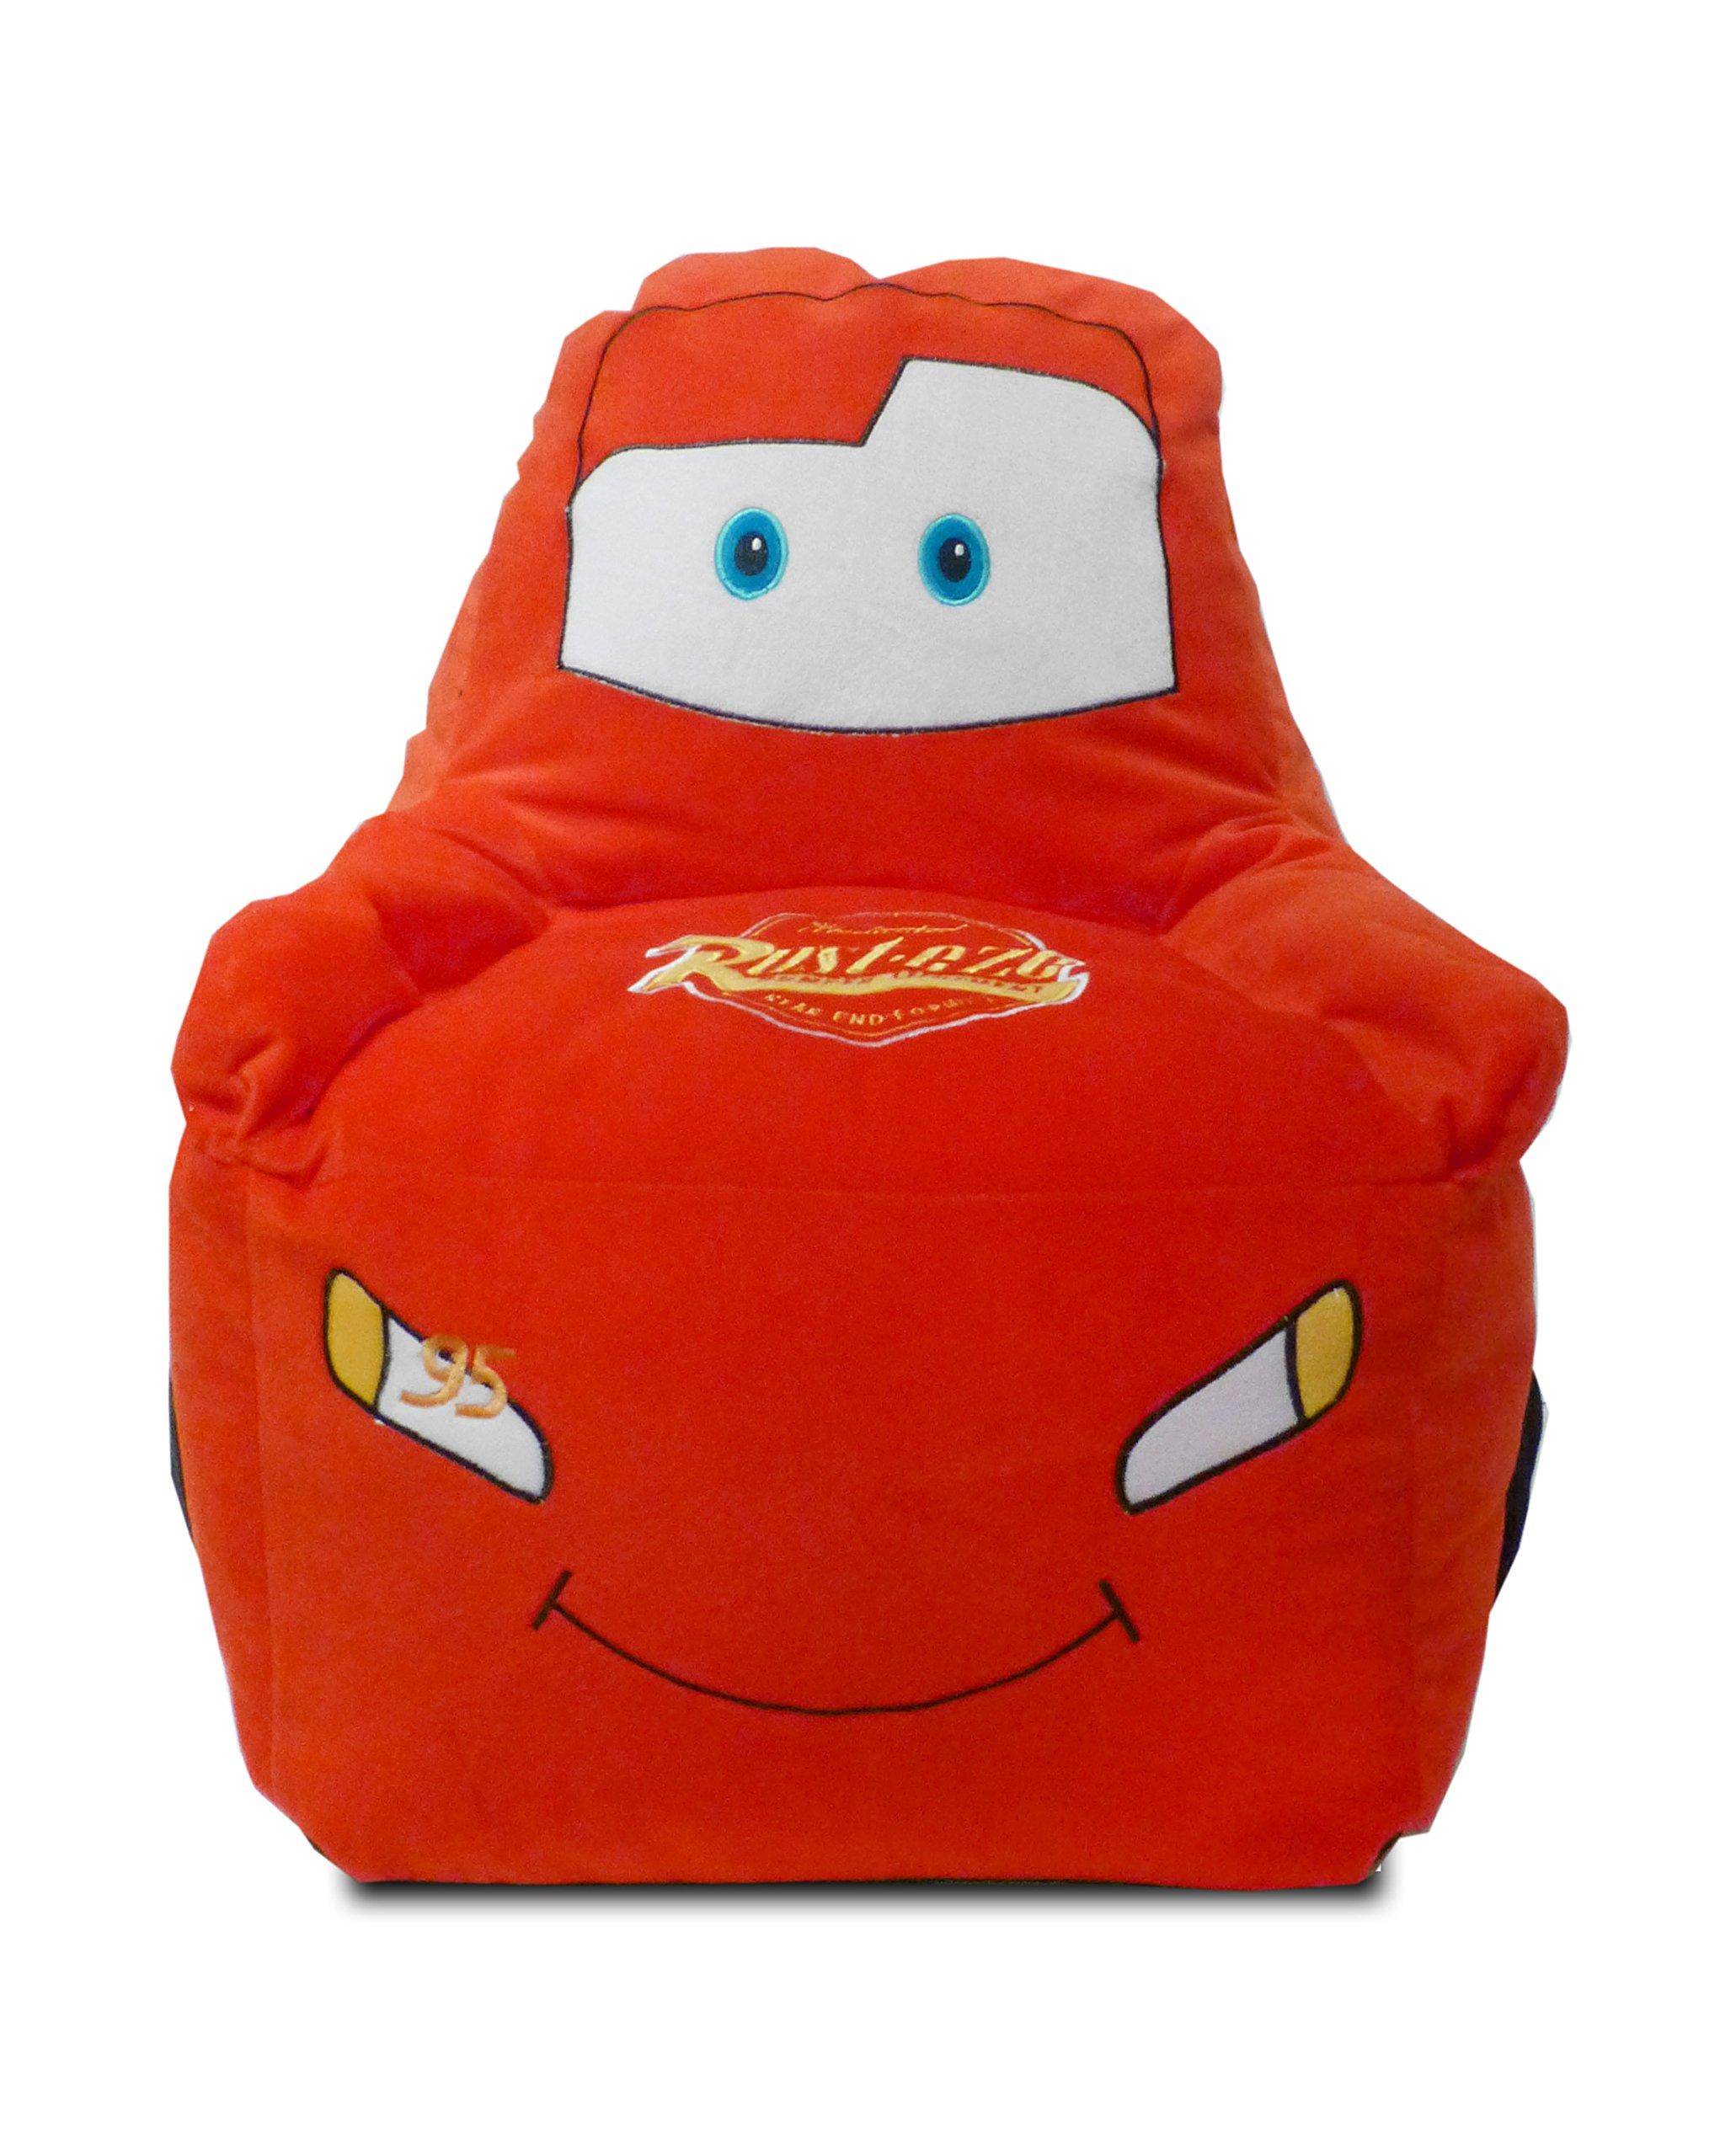 Disney Cars Figural Bean Bag Sofa Chair by Disney (Image #2)